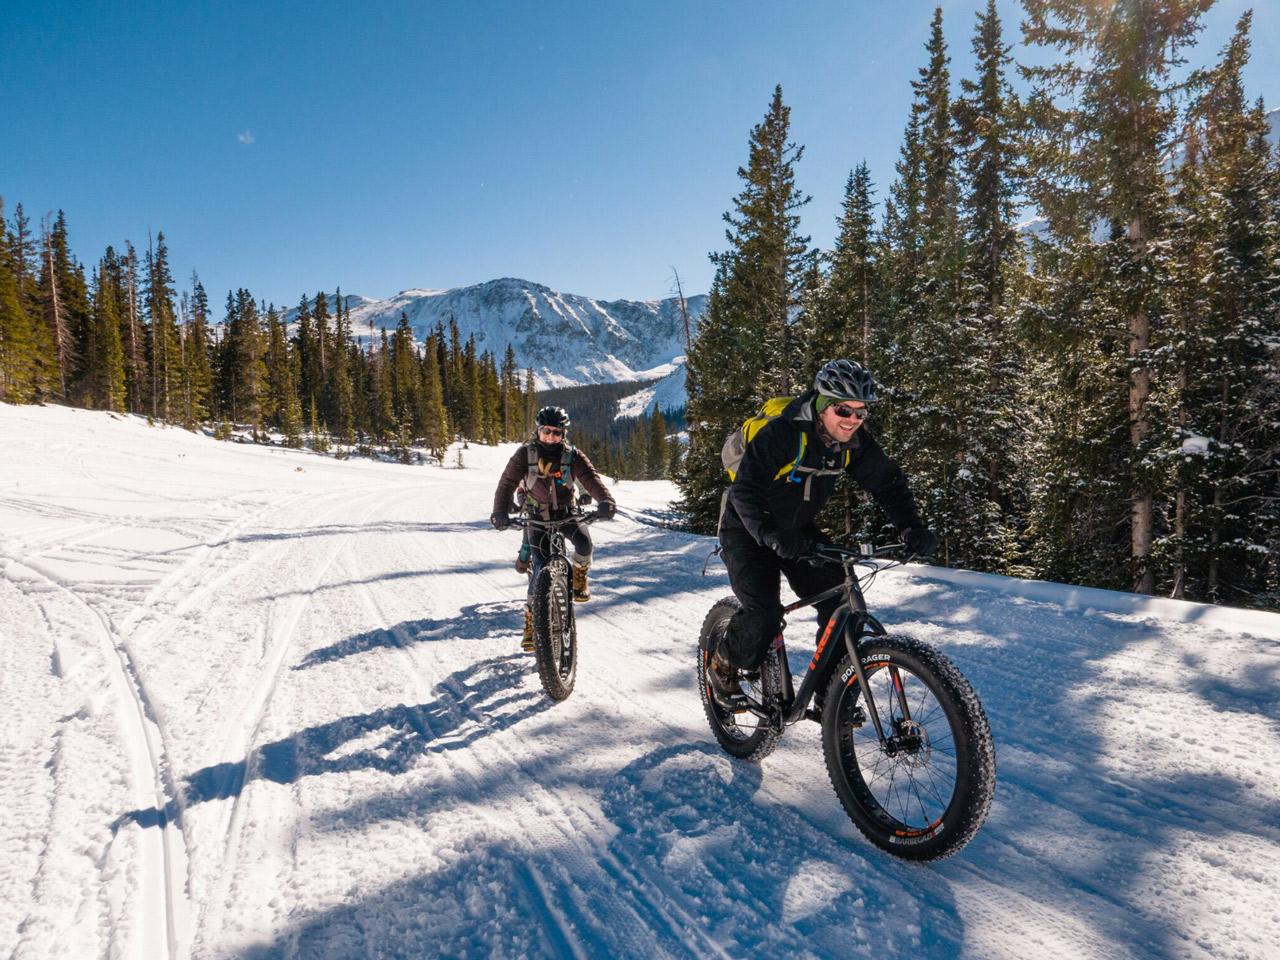 RBR_cottonwood-pass-summit_14